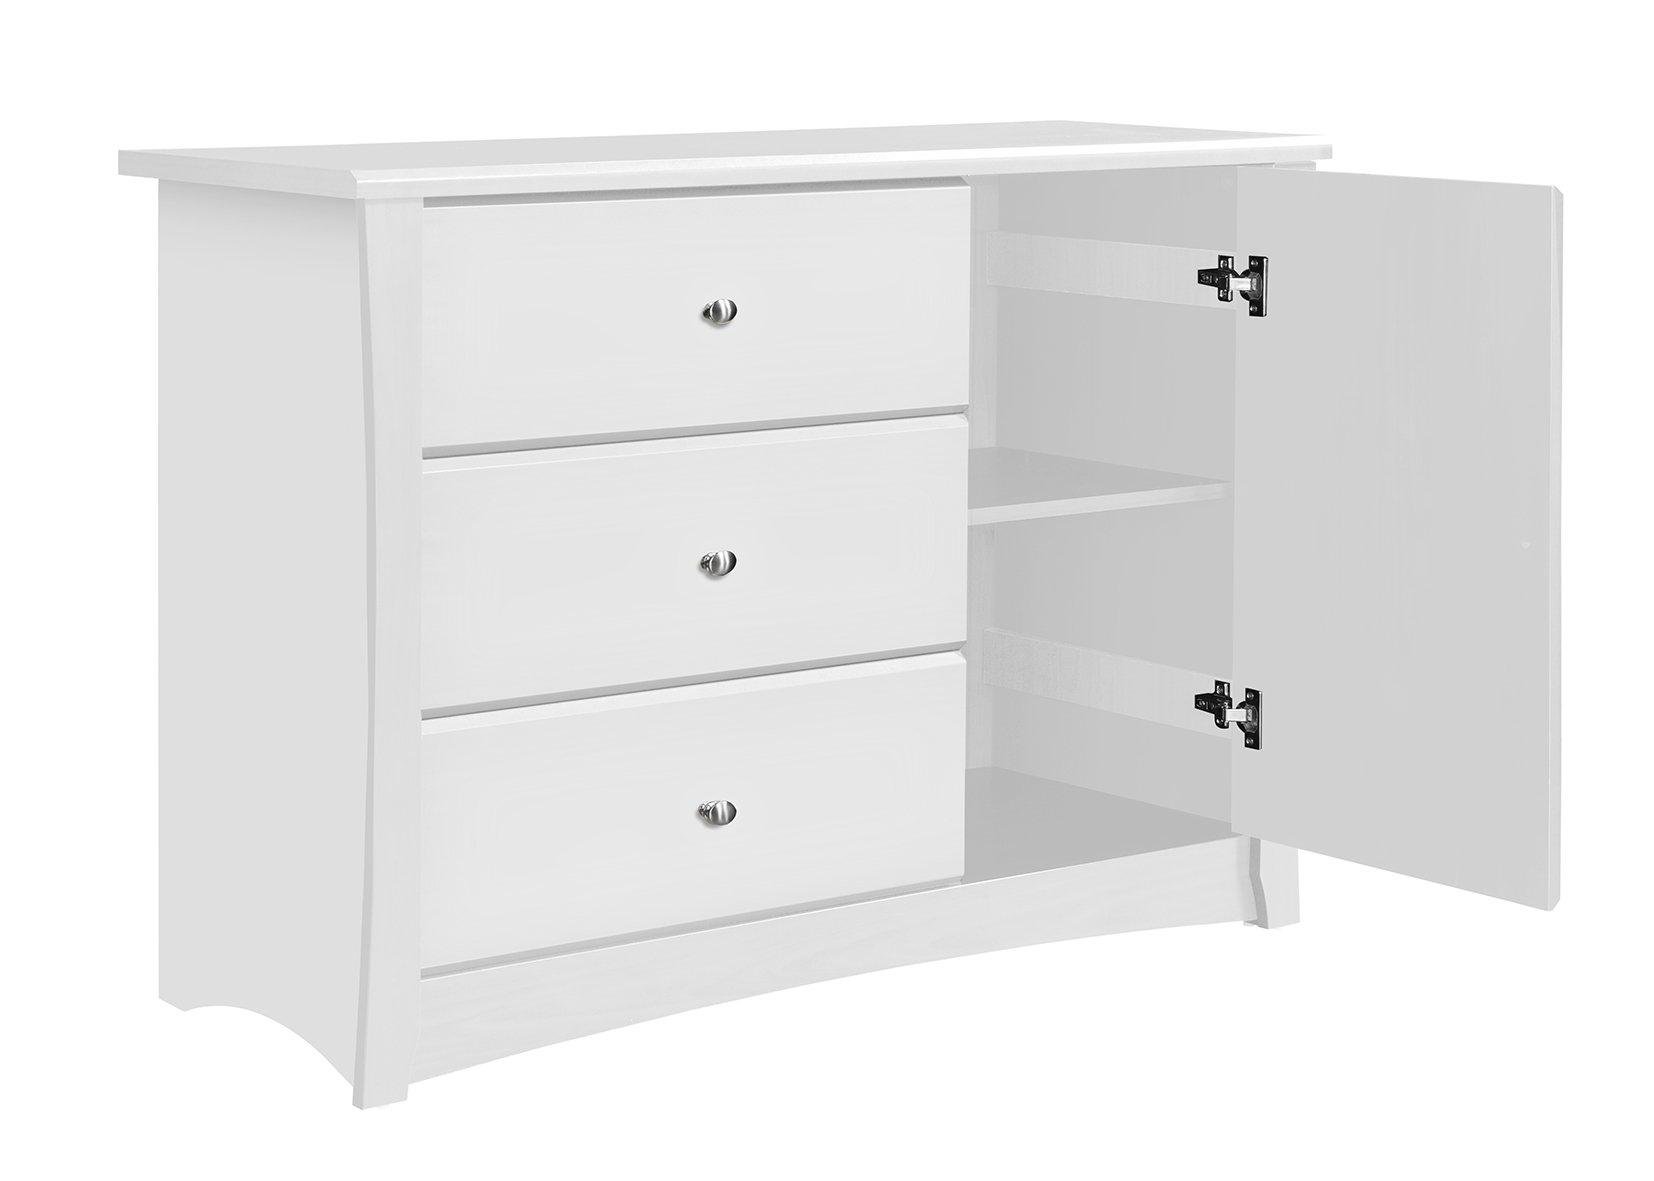 Storkcraft Crescent 3 Drawer Combo Dresser, White by Stork Craft (Image #2)